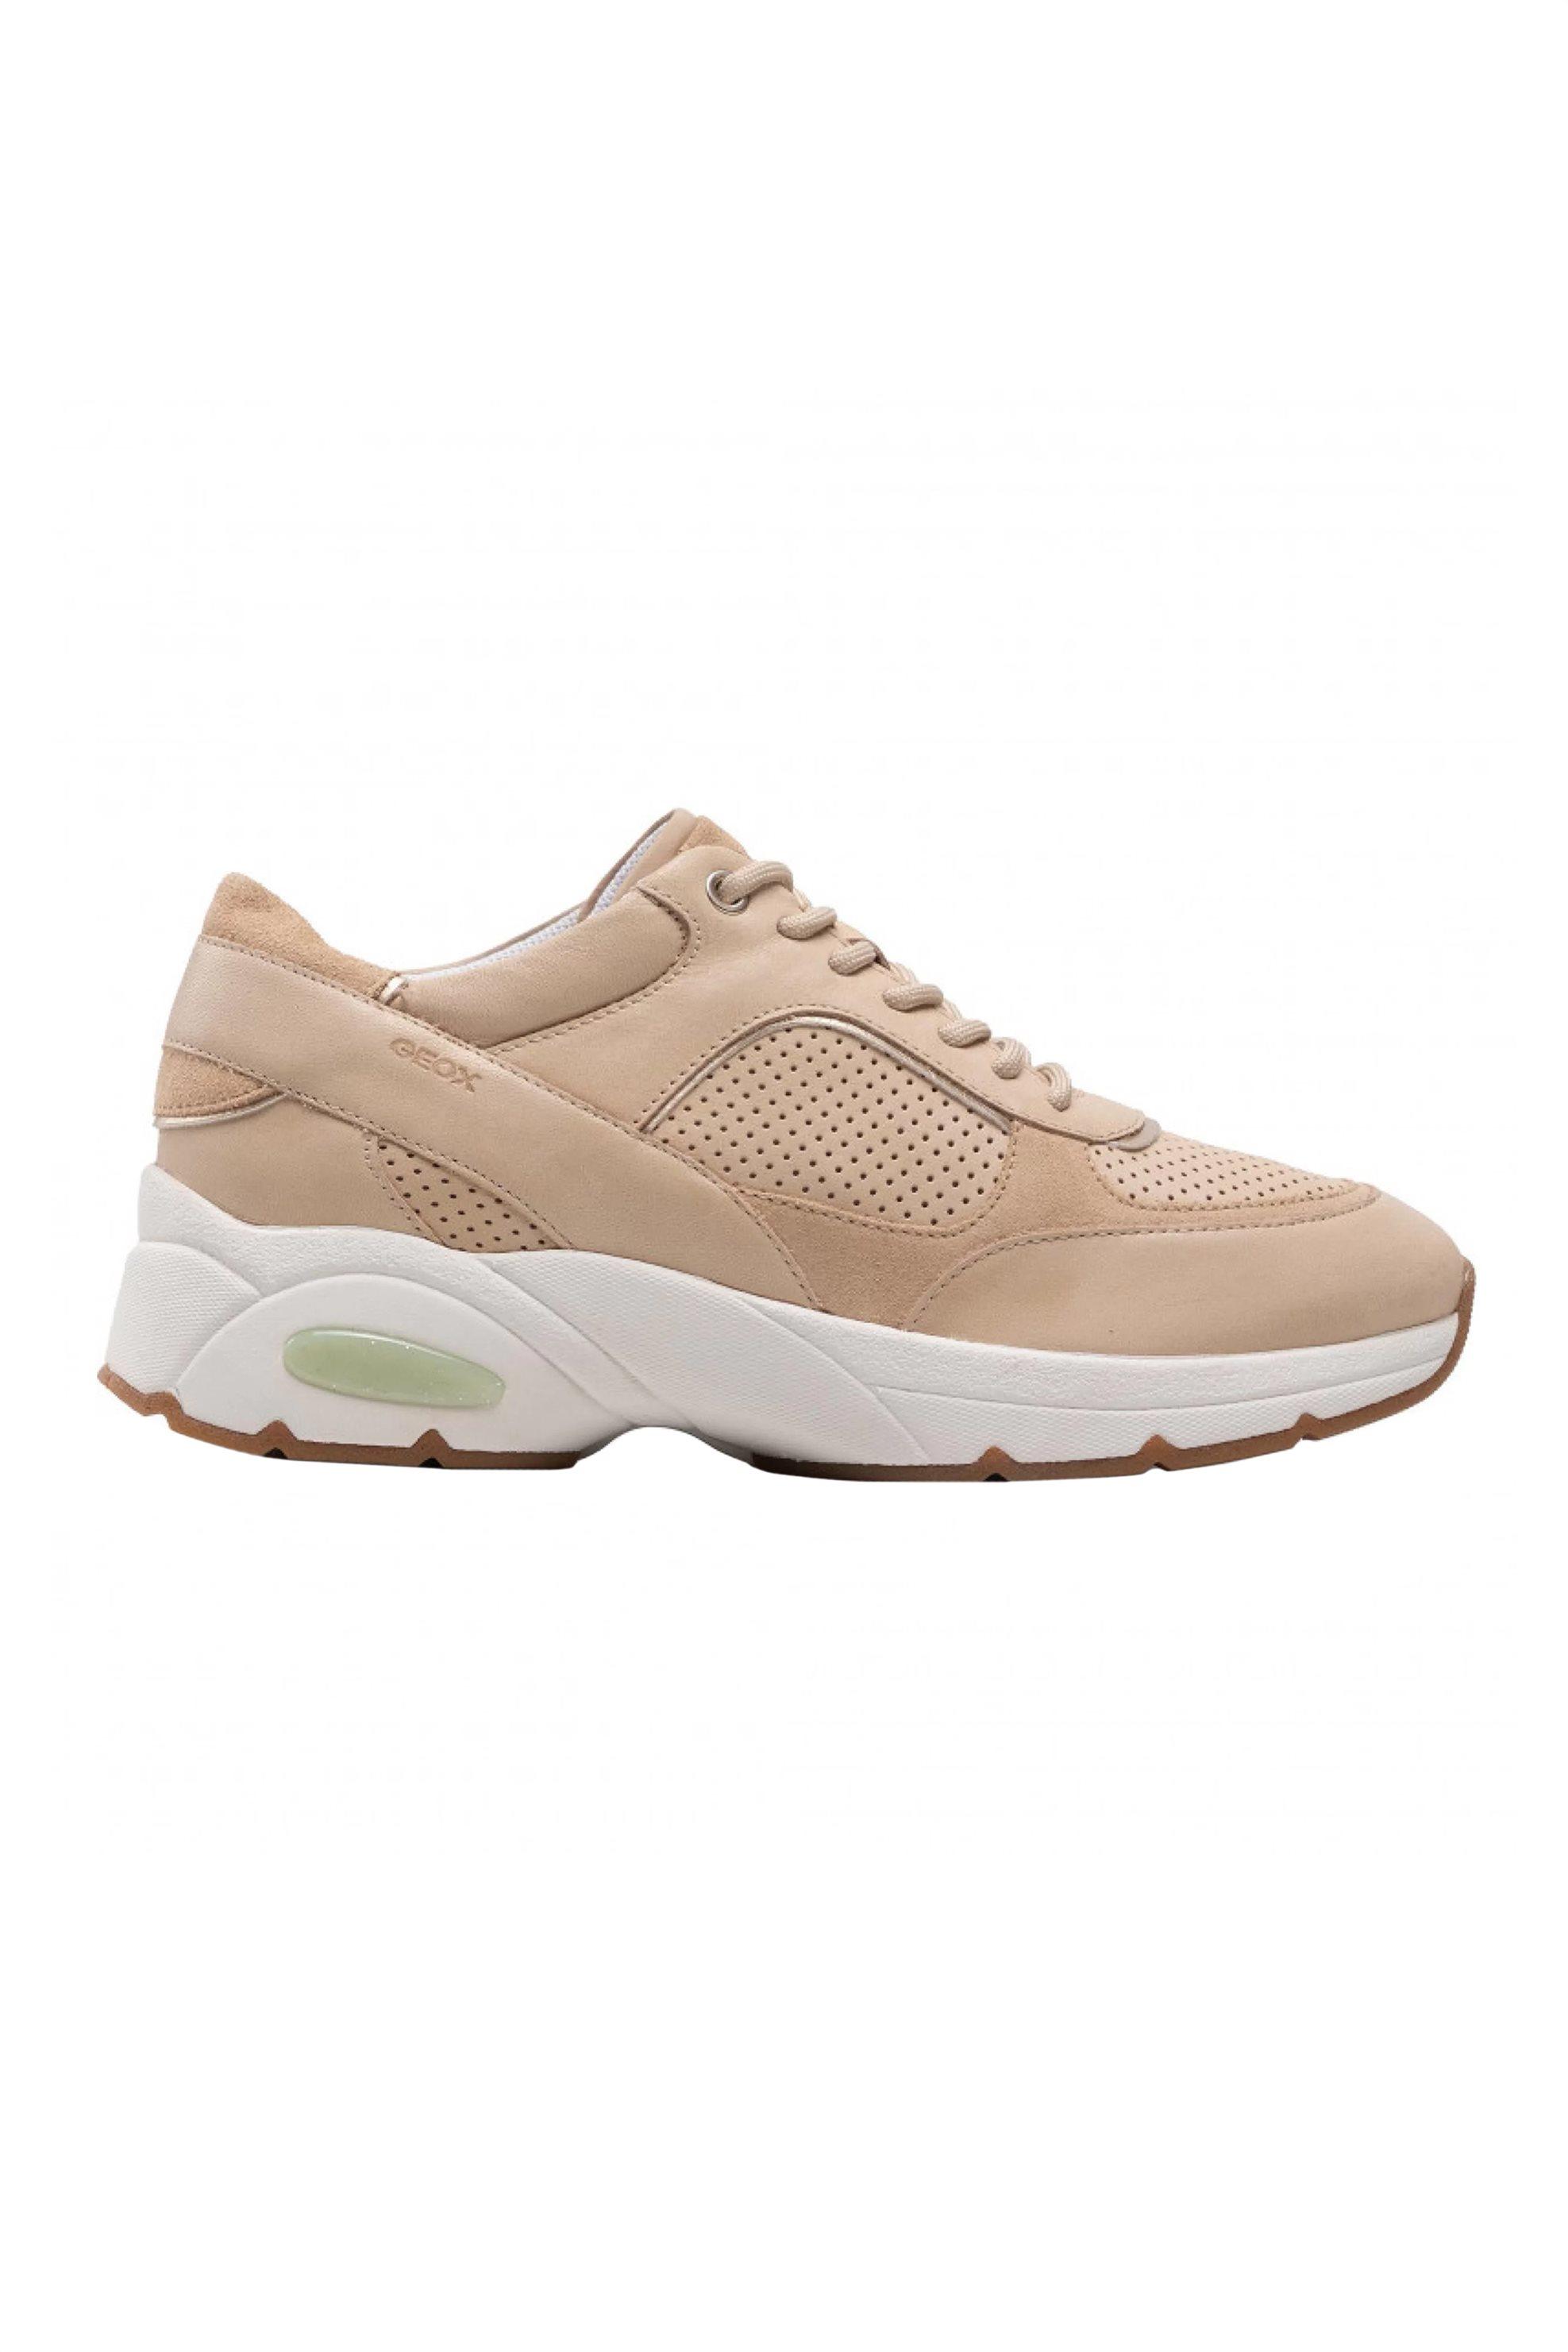 Geox γυναικεία sneakers με suede λεπτομέρειες ''Alhour'' - D15FGA0CL22C5004 - Μπεζ